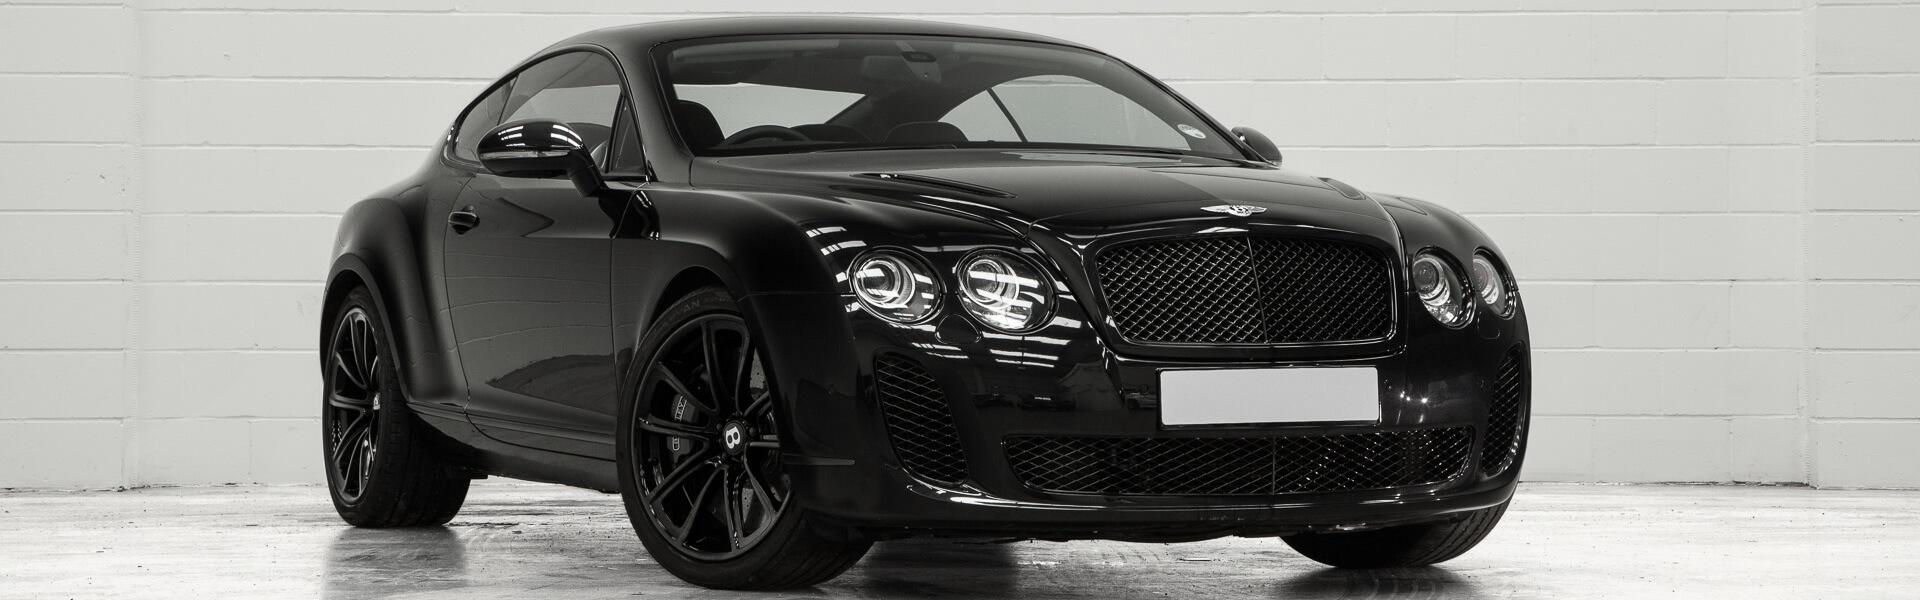 Rent Corvette Stingray >> Bentley GT SuperSport Rental Las Vegas Exotic Cars Vegas